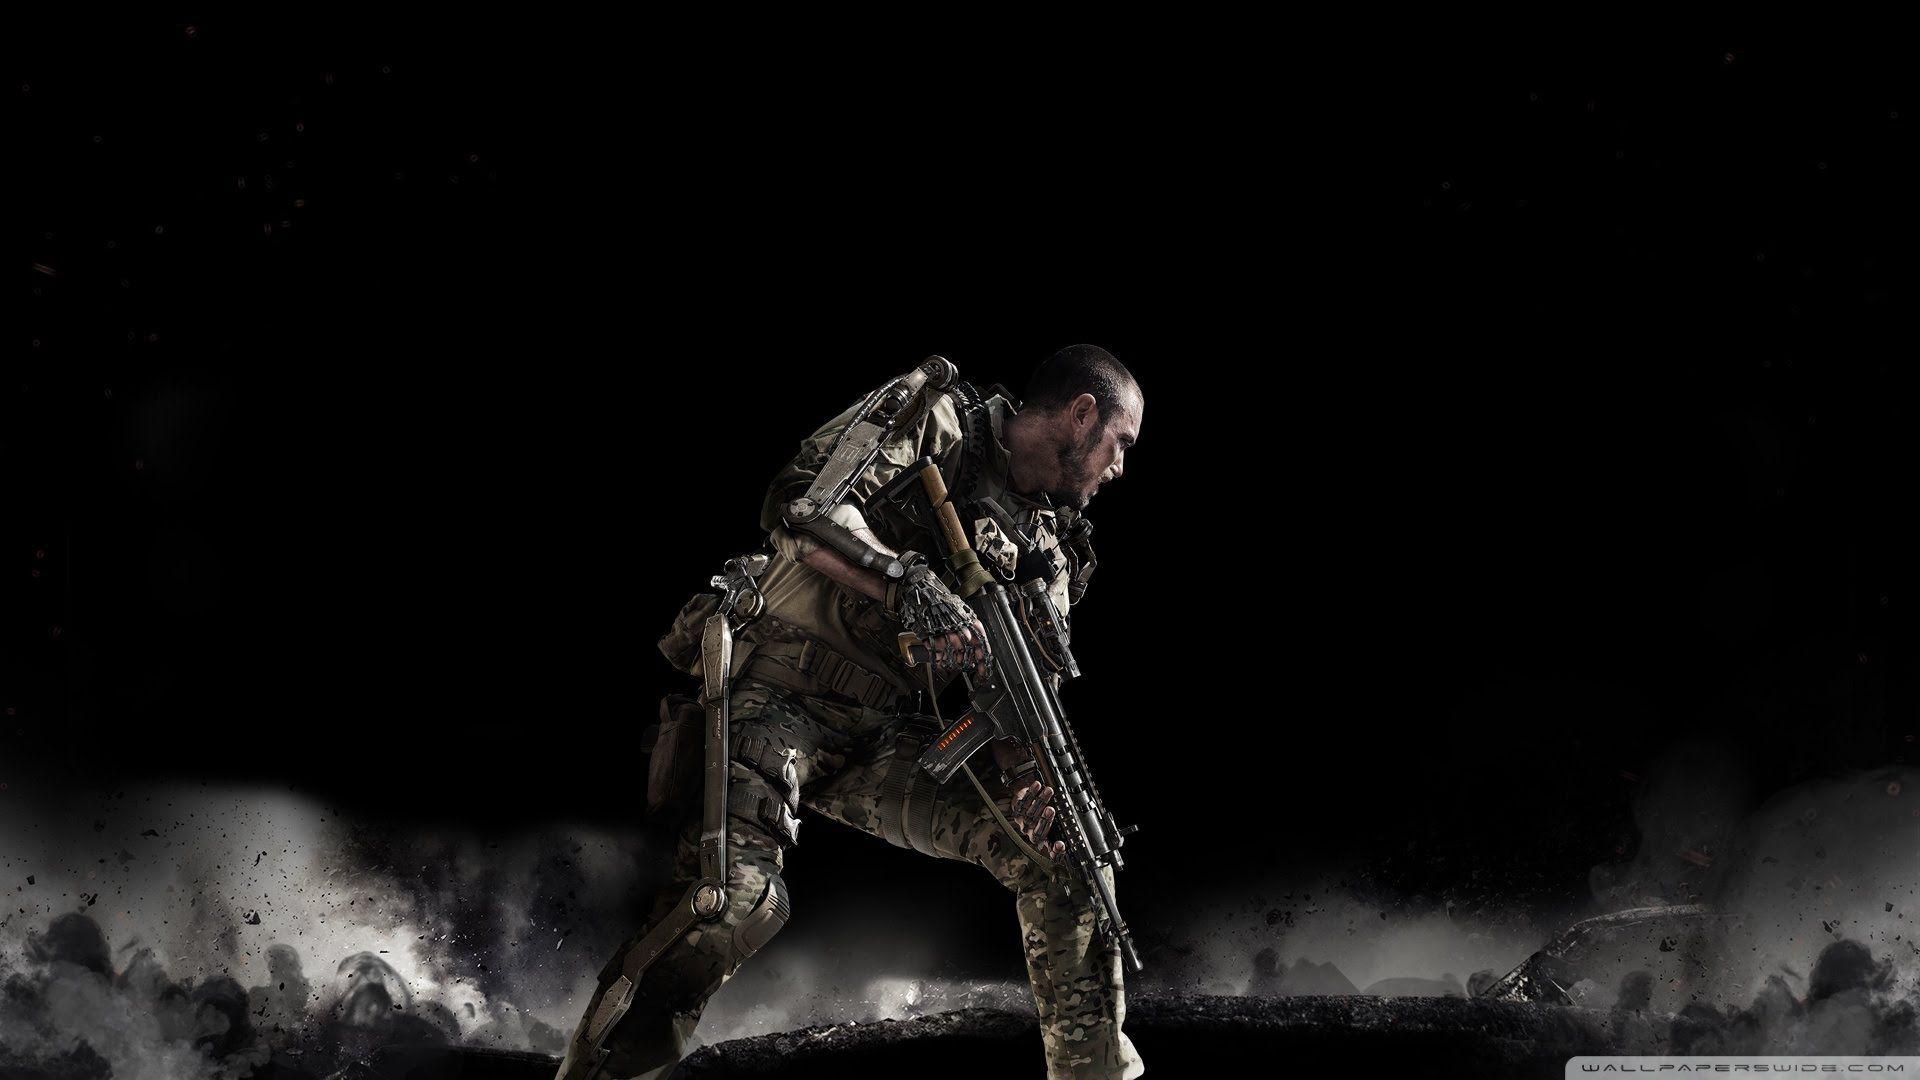 Call Of Duty Advanced Warfare Wallpaper Free Download